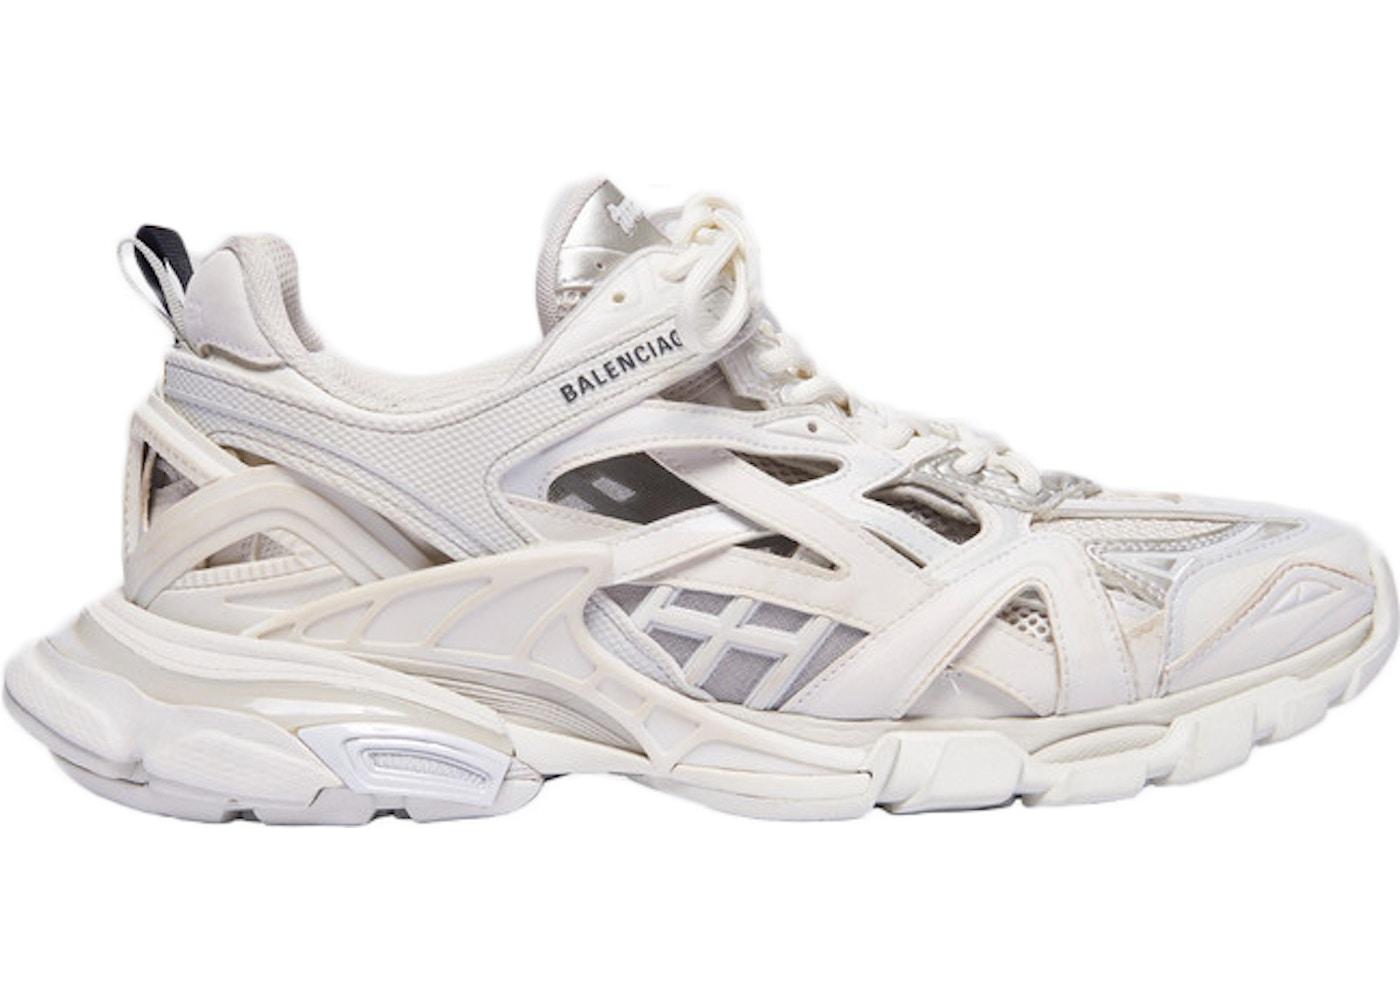 Balenciaga Track 2 White 568614w2gn19000